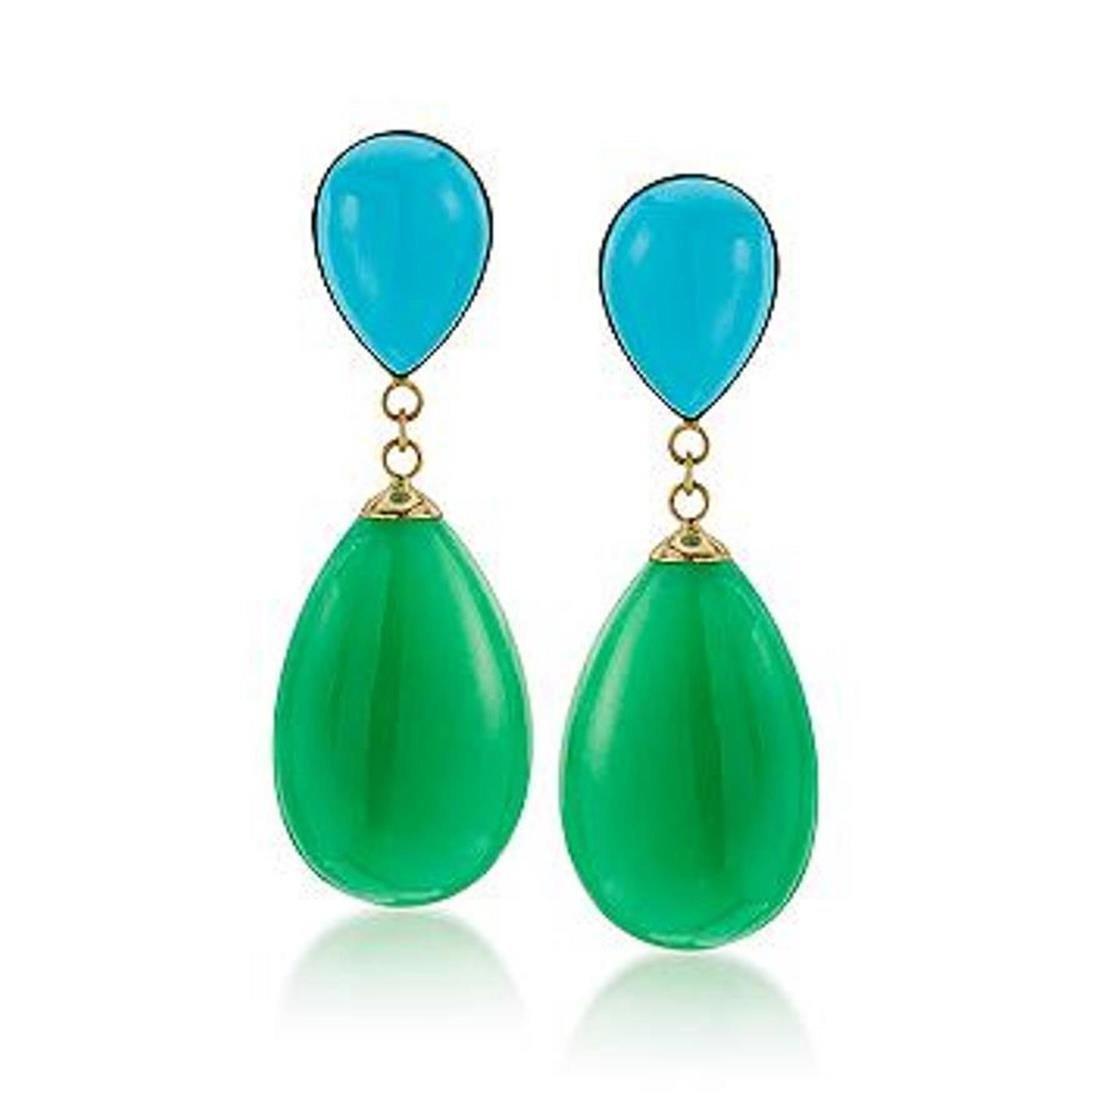 Turquoise and Green Jade Teardrop Earrings in 14kt